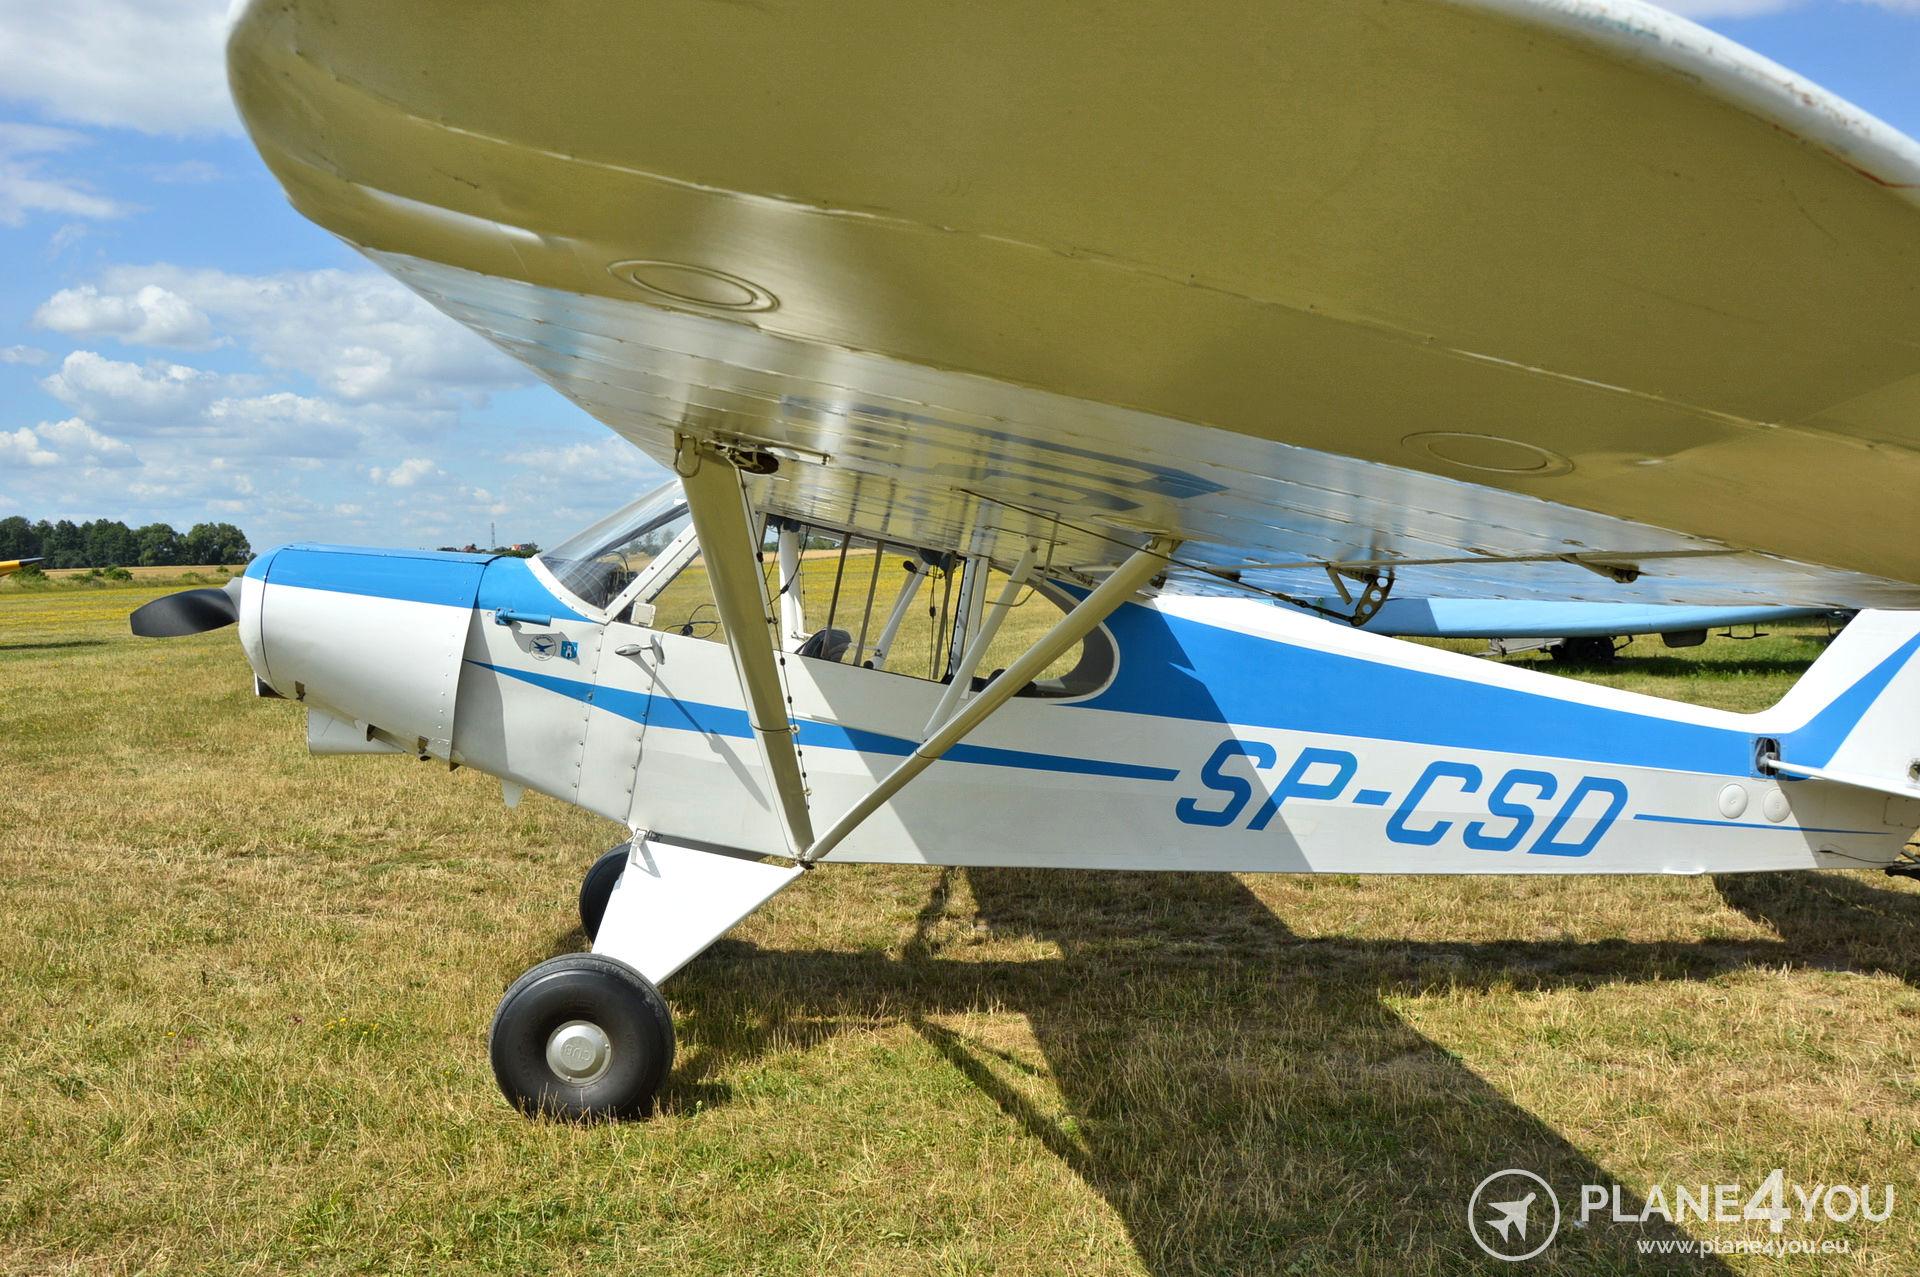 Piper PA18-150 Super Cub SP-CSD | Single-engine aircraft